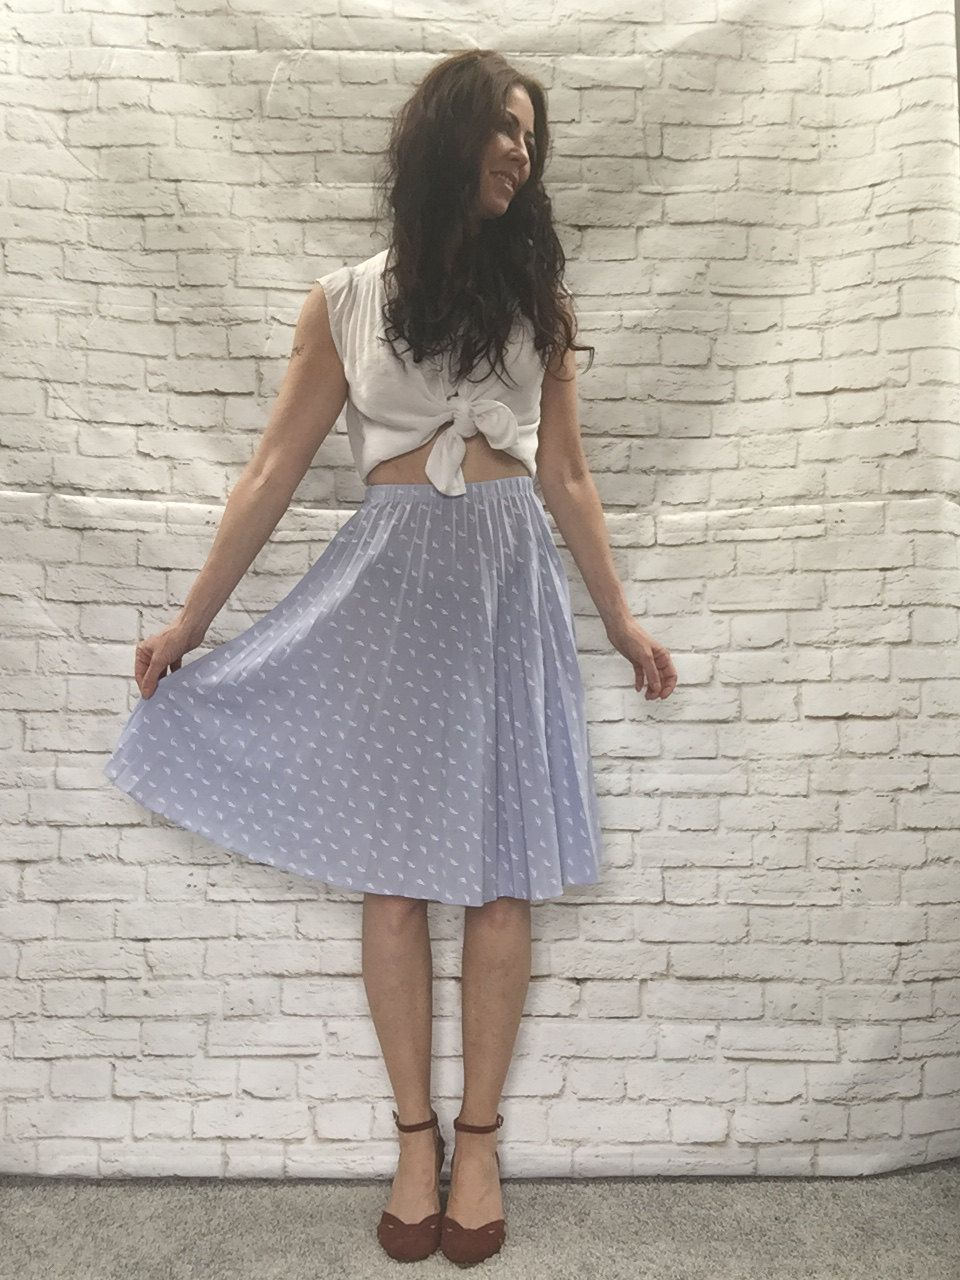 Vintage 80s Art Deco Print Pleated Skirt XS High Waist Swing Knee Length Lavender Gray by PopFizzVintage on Etsy